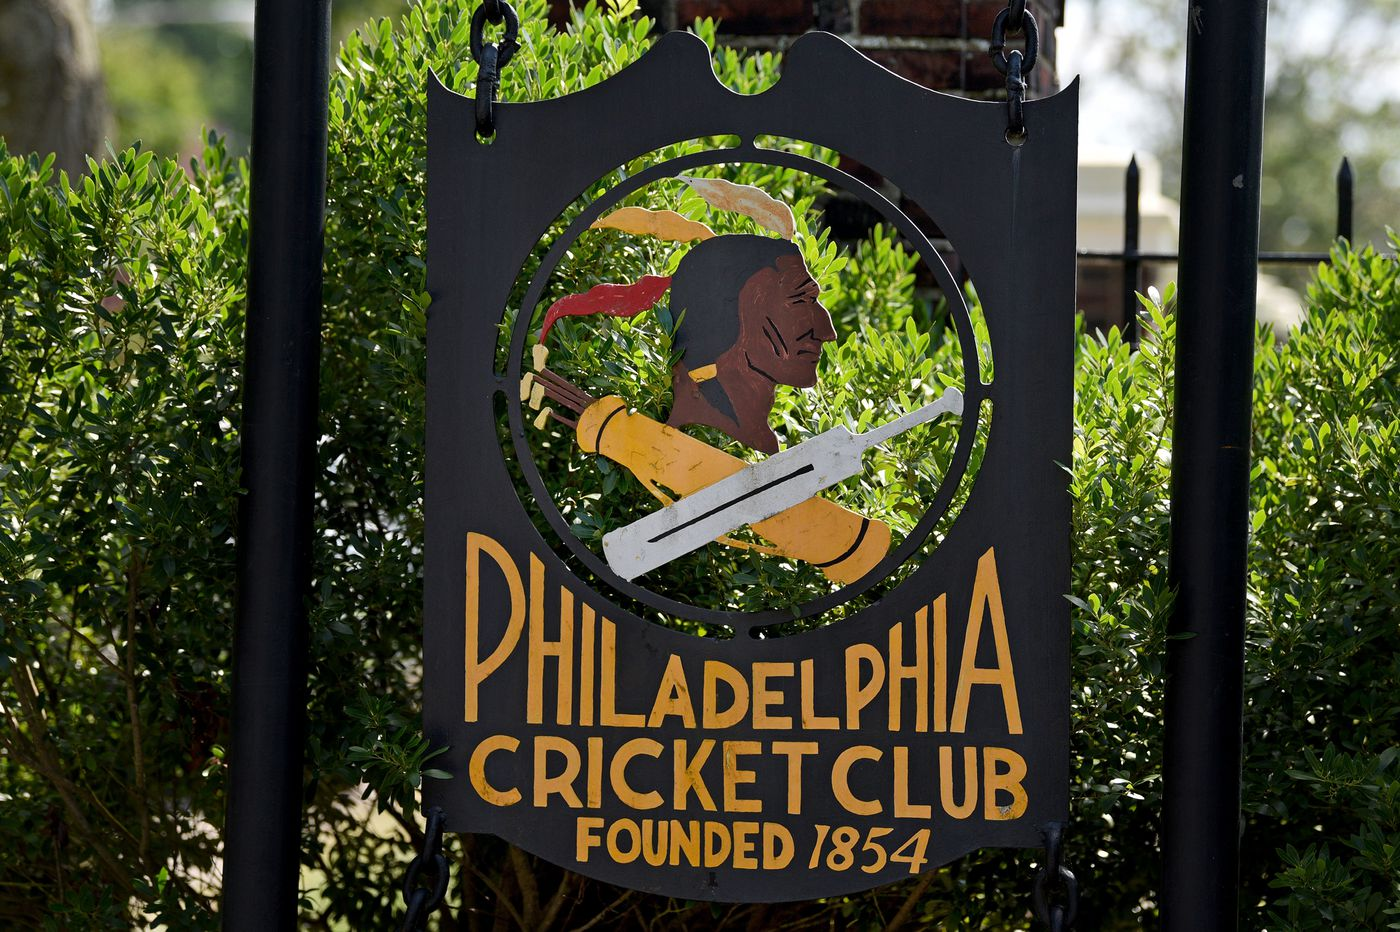 Chestnut Hill church asks Philadelphia Cricket Club to retire its 'offensive' Native American logo